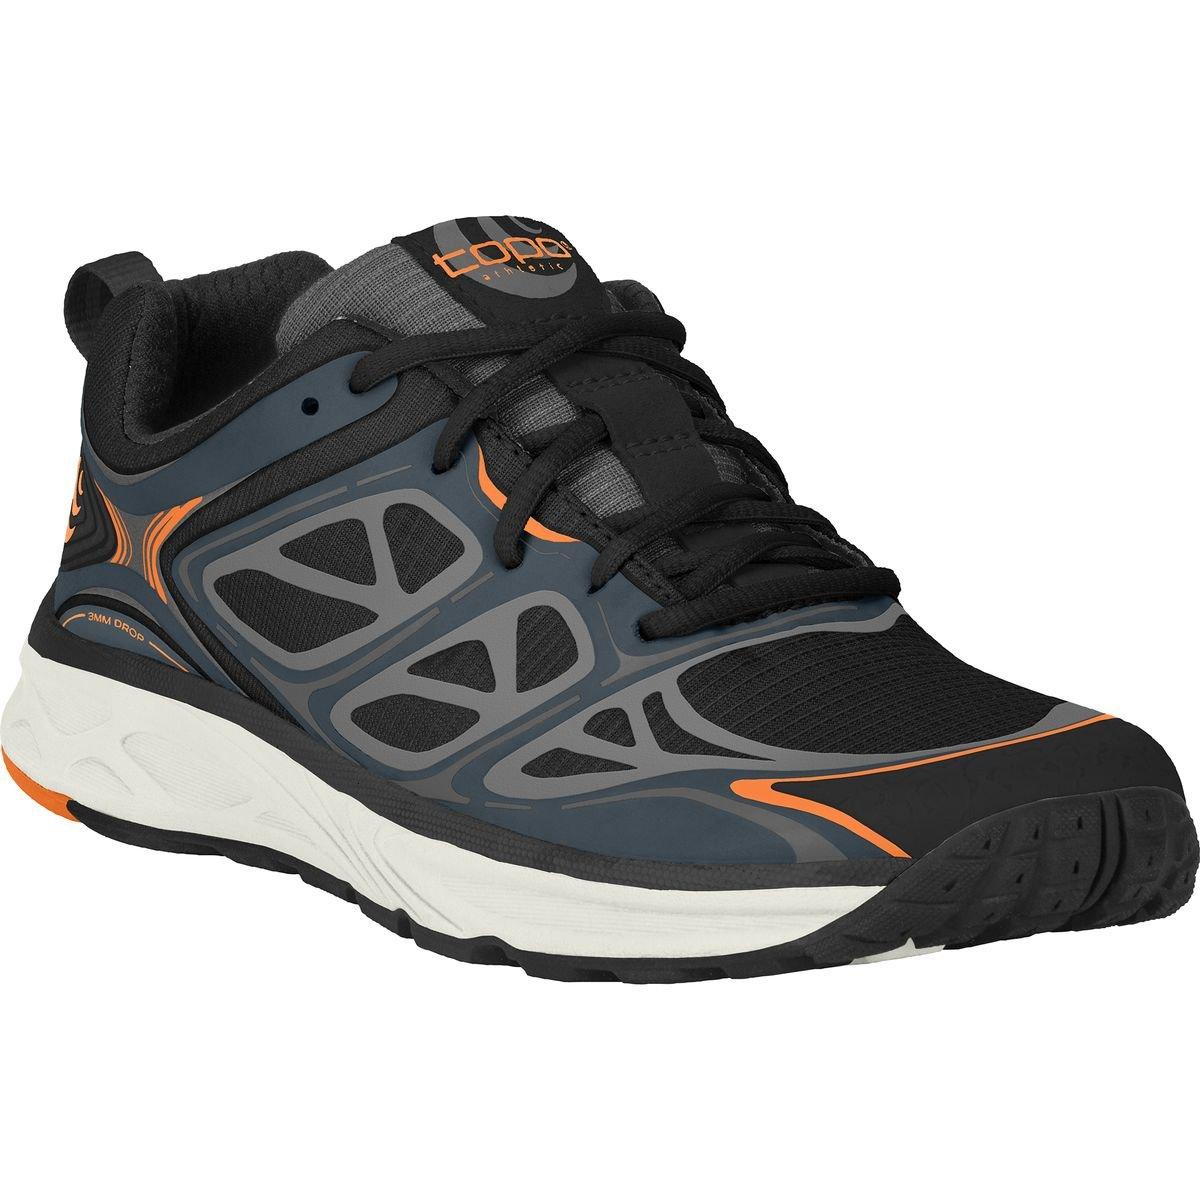 Topo Athletic Fli-Lyte Running Shoe - Men's B0195H74IY 11.5 D(M) US|Black/Ink